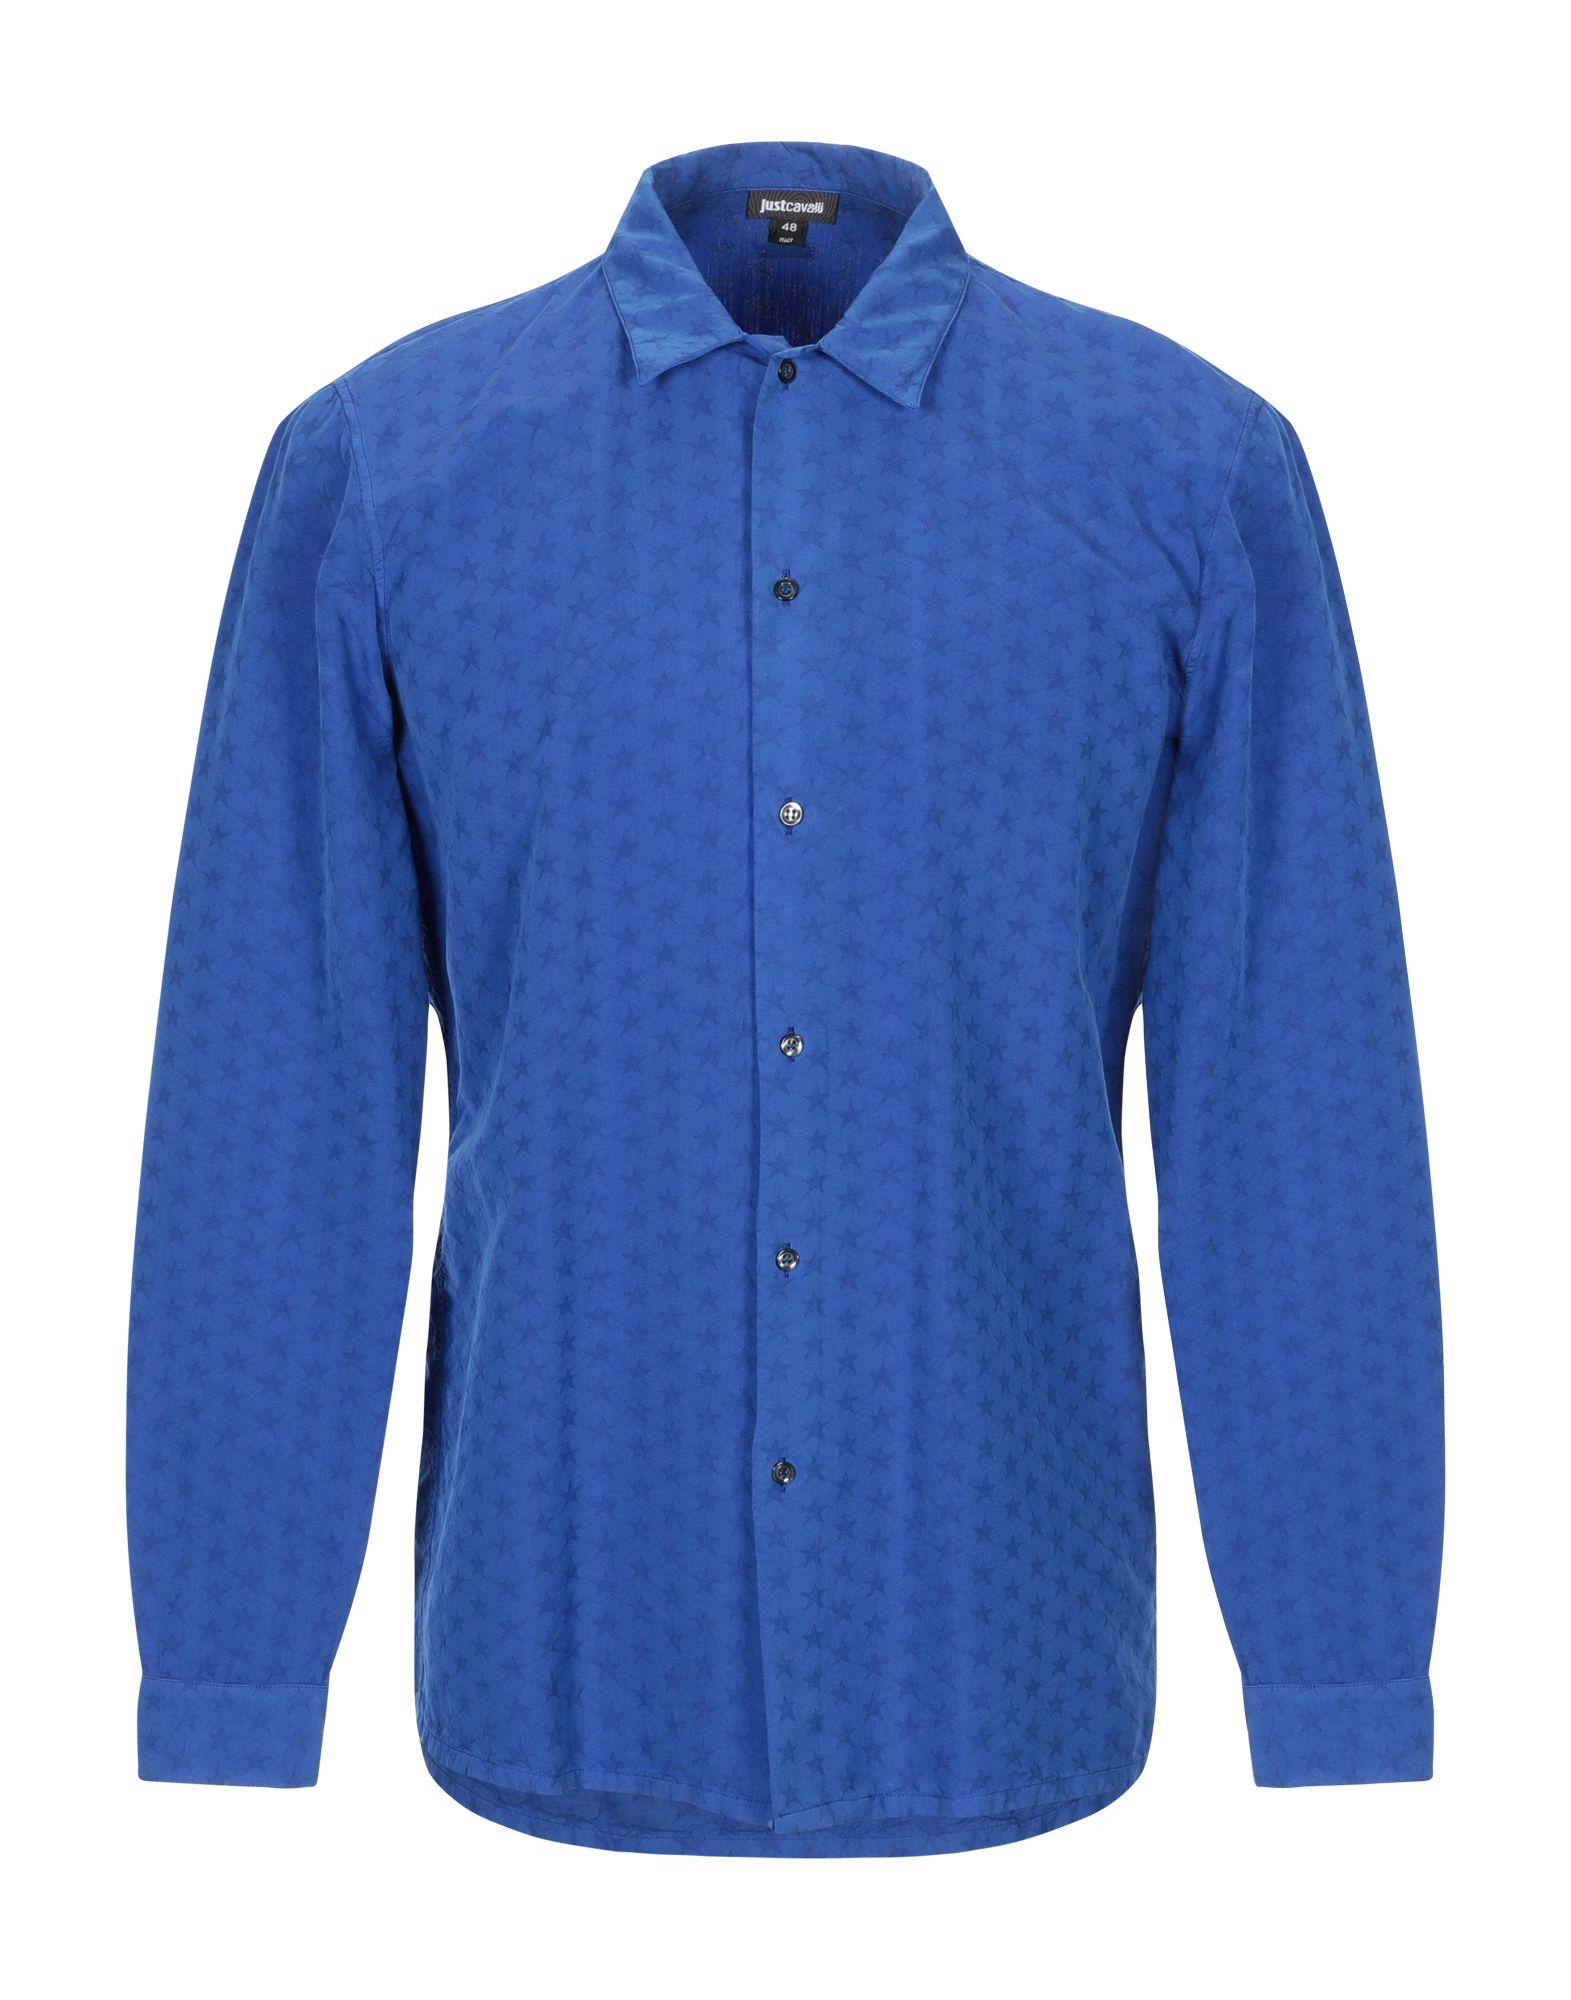 Camicia Tinta Unita Just Cavalli uomo - 38824011LW 38824011LW  bis zu 80% sparen